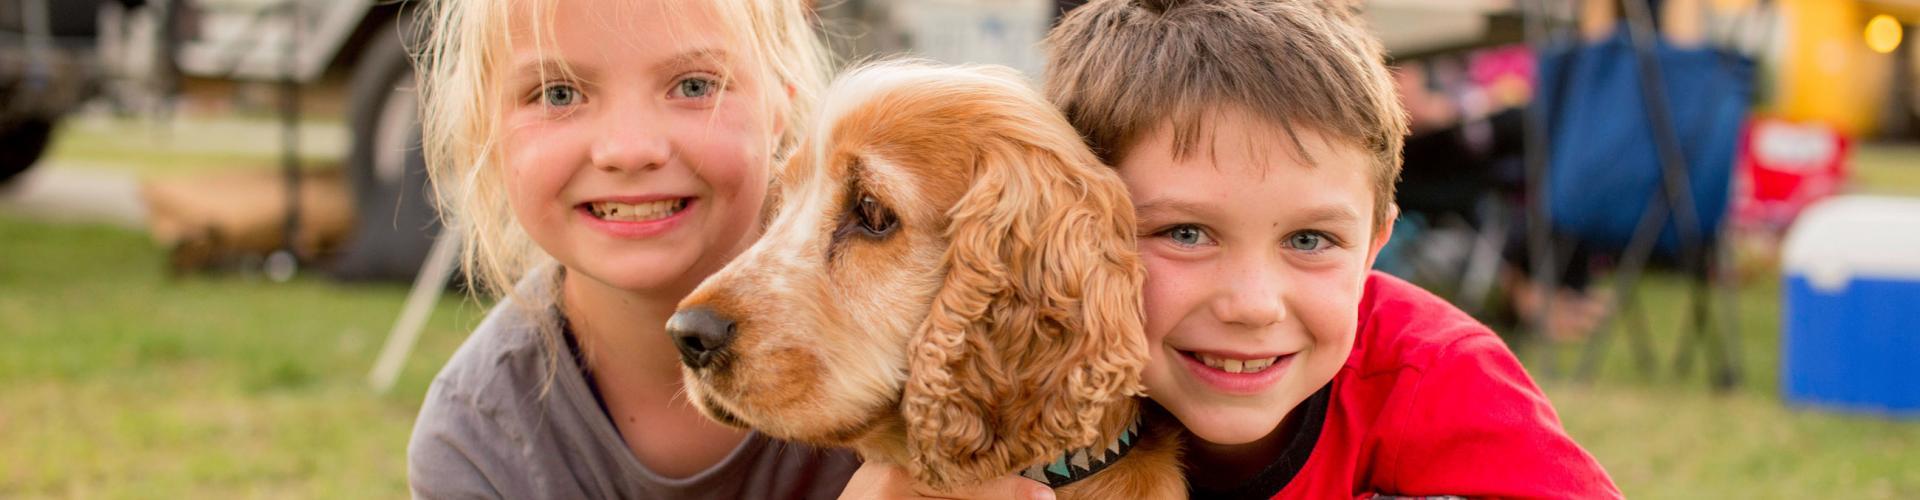 BIG4 Bendigo Park Lane Holiday Park - Children camping with pet